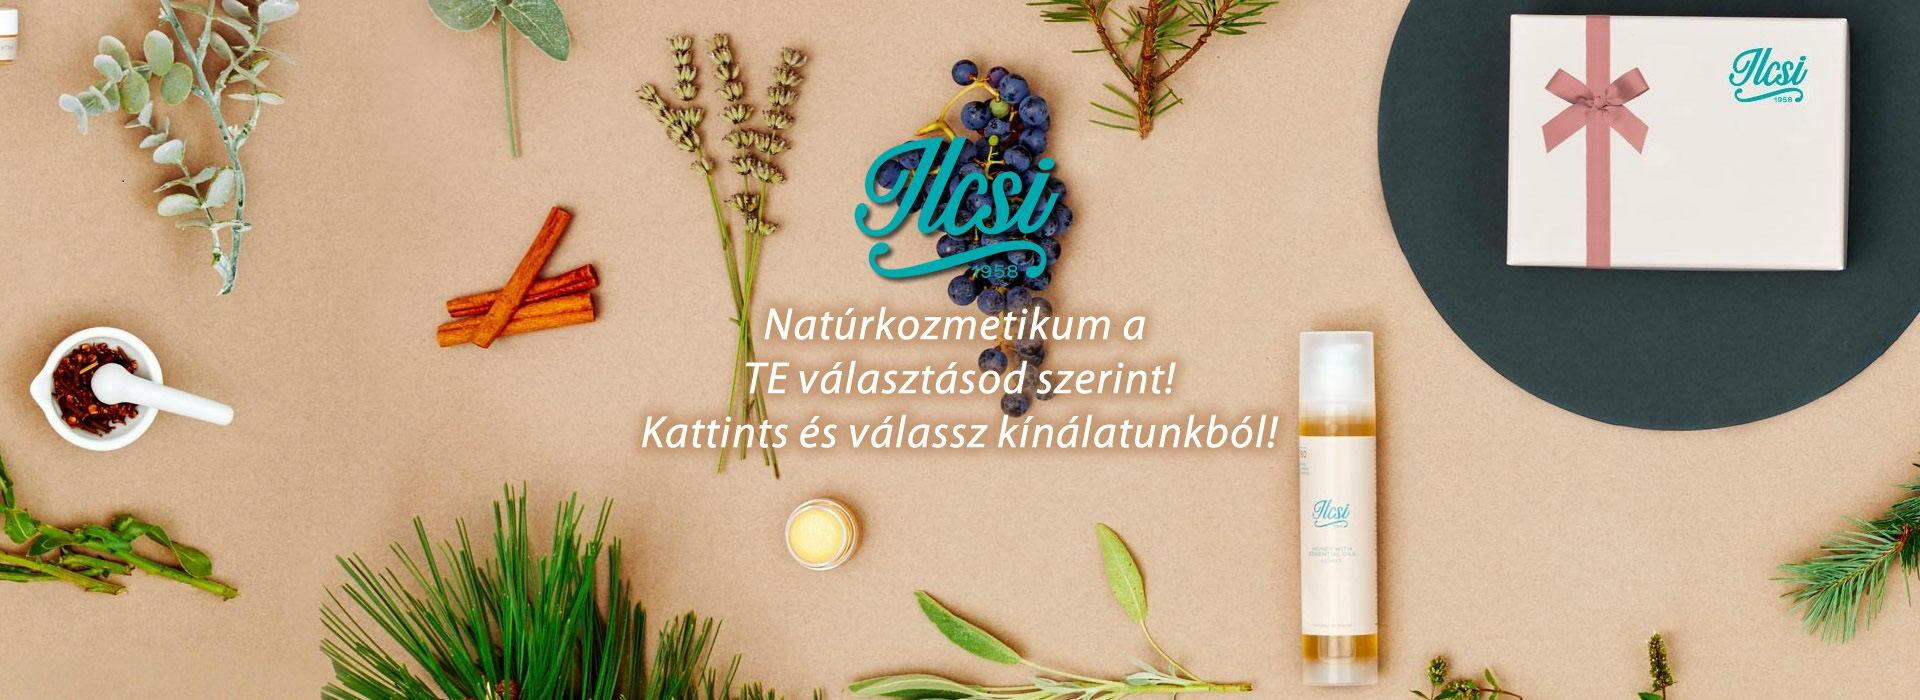 ILCSI Natúrkozmetikumok